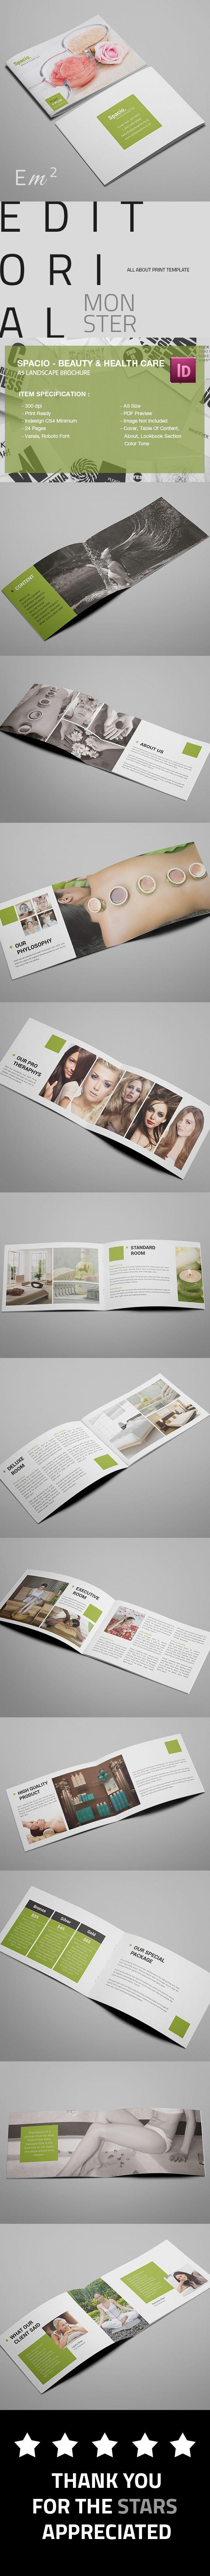 Spacio - Spa Beauty and Health Care A5 Brochure on Behance